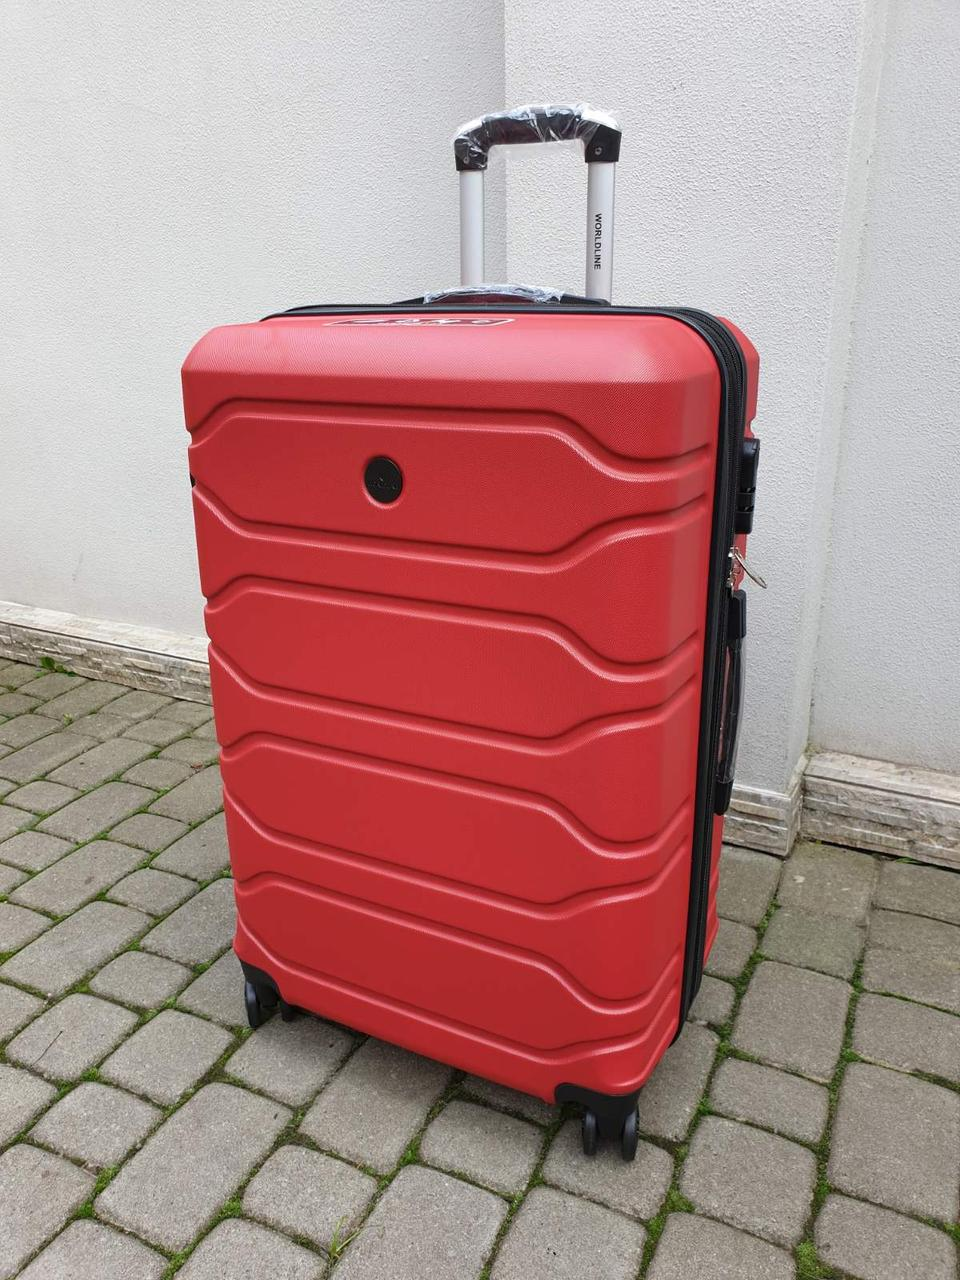 WORDLINE 613 ( AIRTEX ) Франція валізи чемодани, сумки на колесах